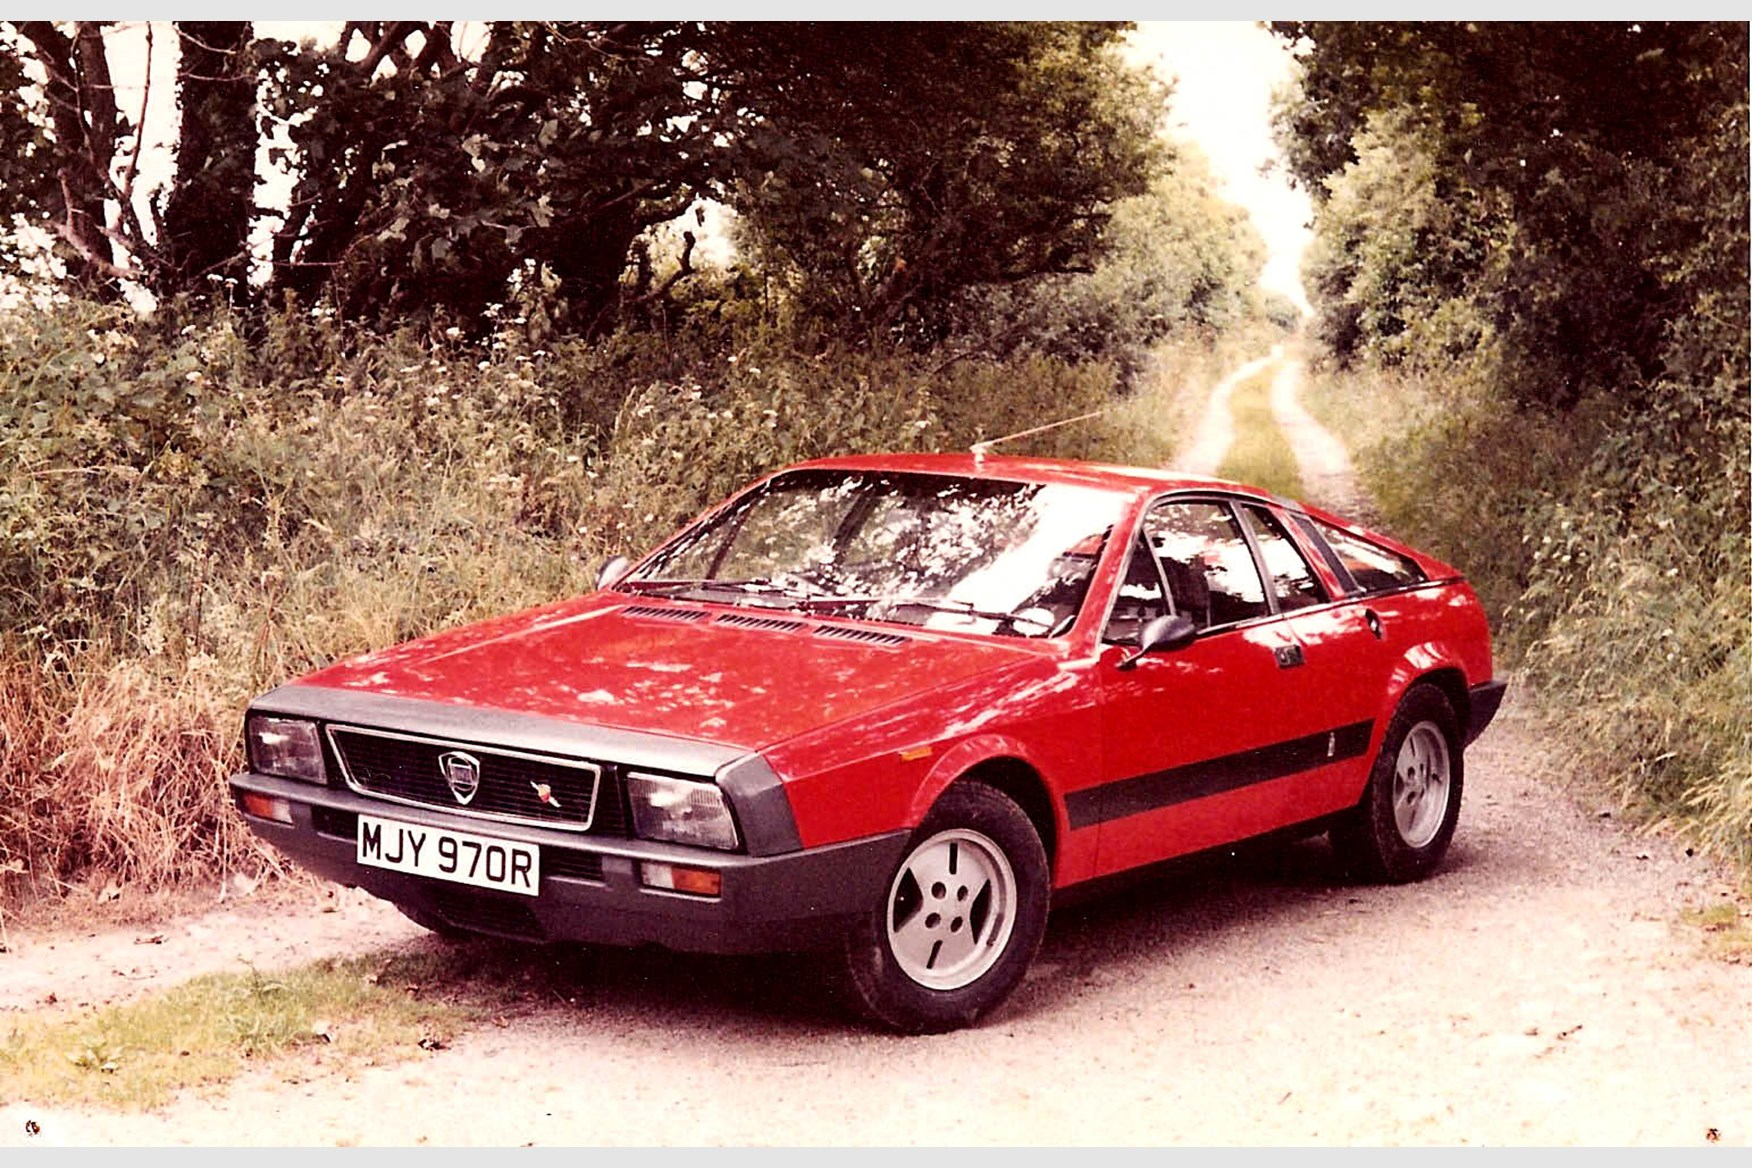 Lancia Beta Monte Carlo Reader Review